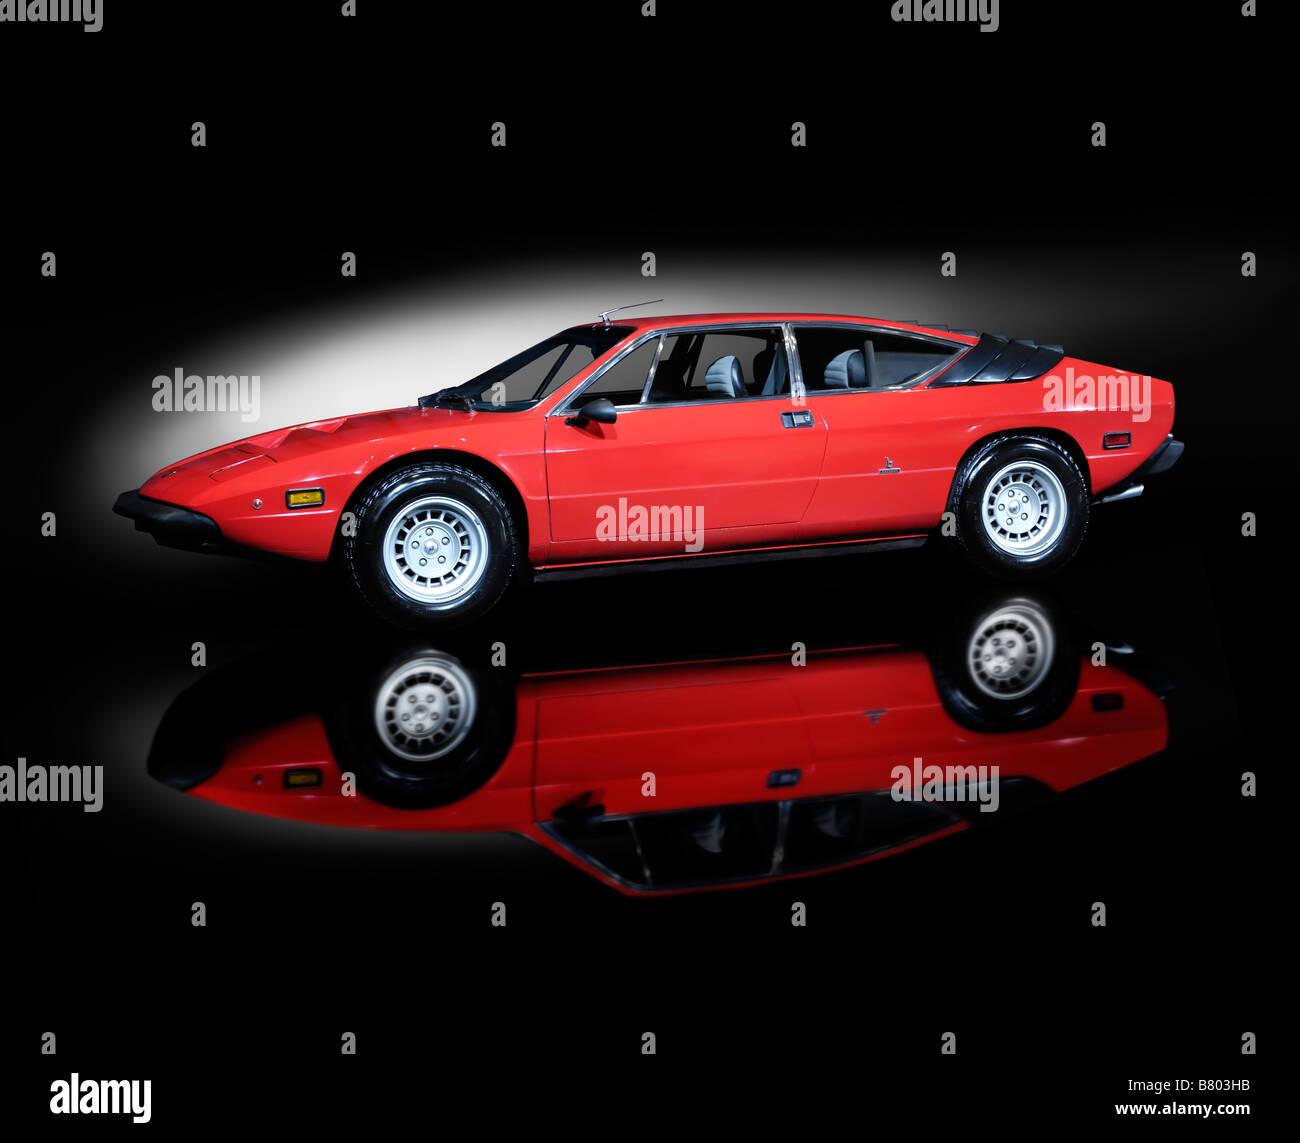 Lamborghini Urraco rouge super voiture rétro Photo Stock